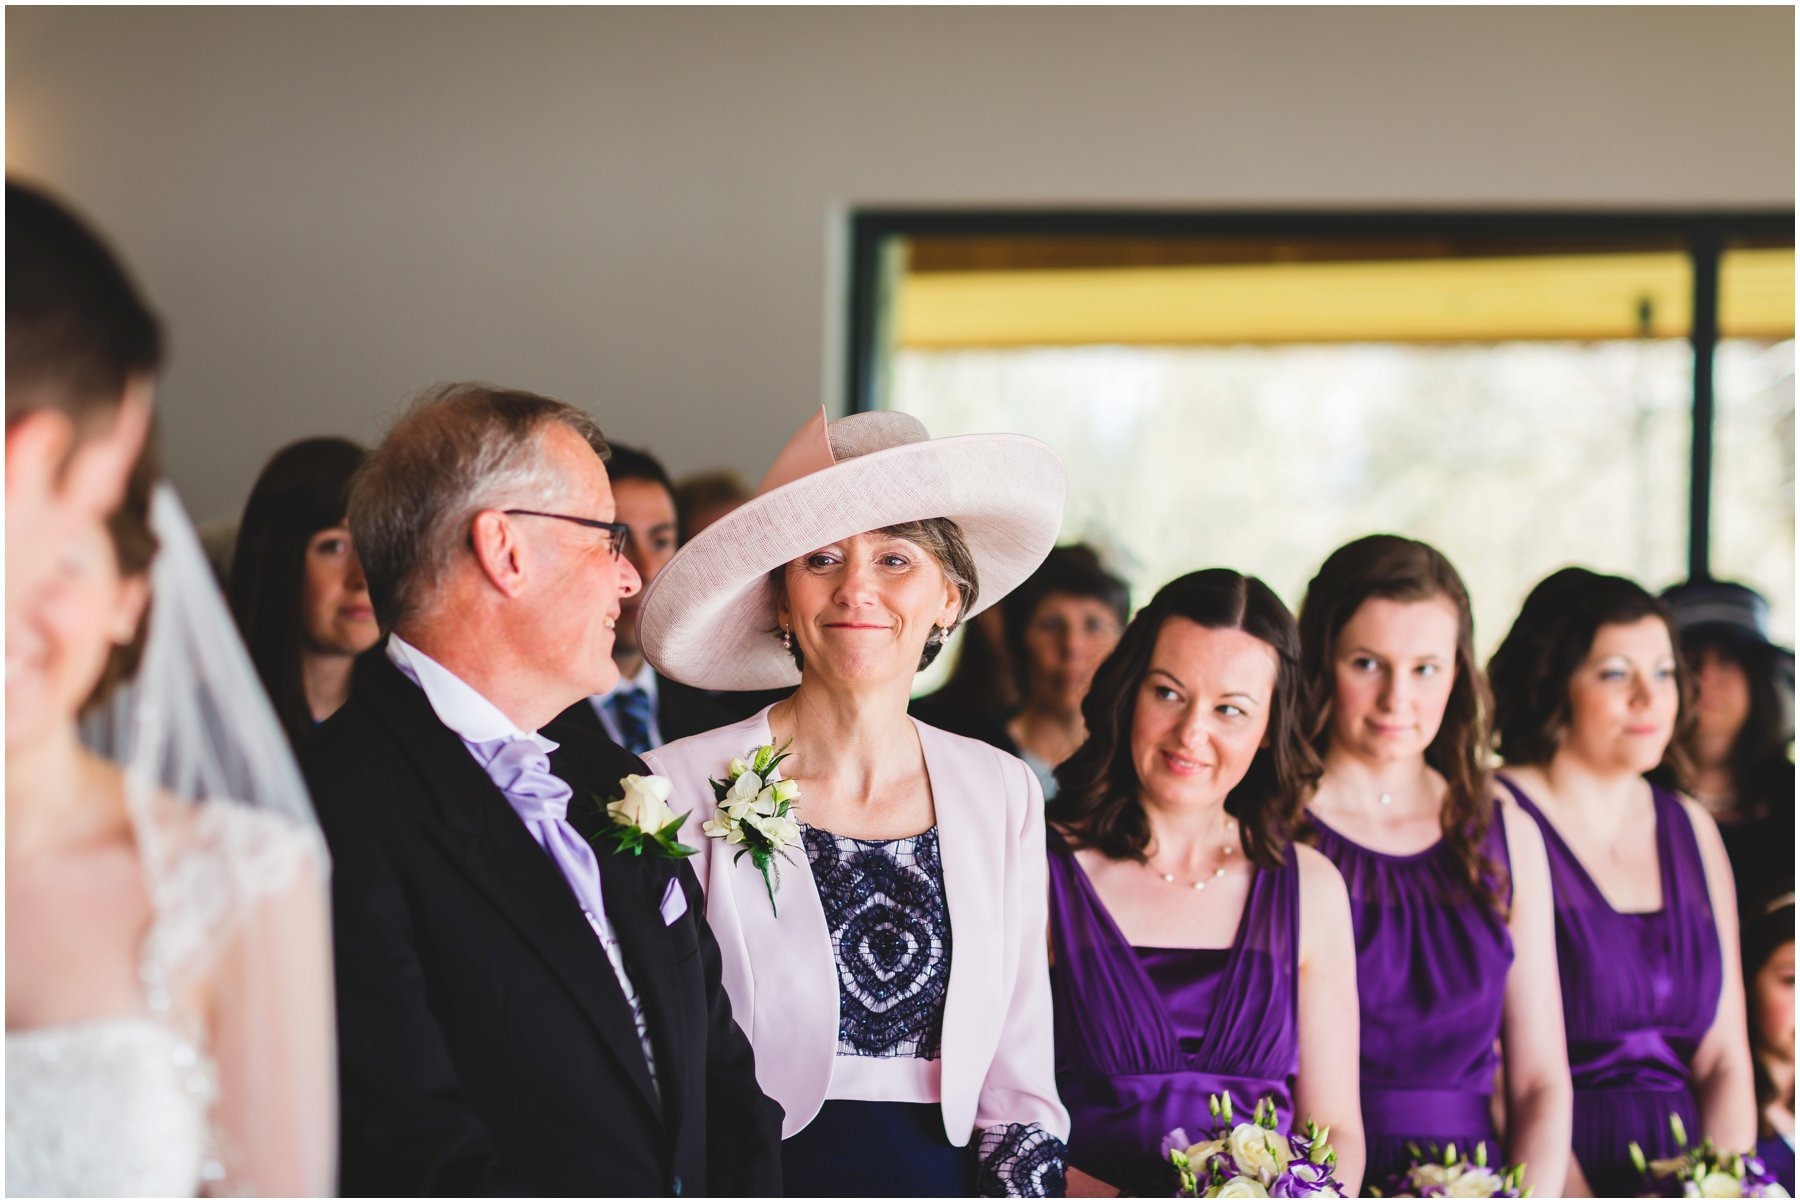 SOME 2015 WEDDING PHOTOGRAPHY MOMENTS - NORFOLK WEDDING PHOTOGRAPHER 1